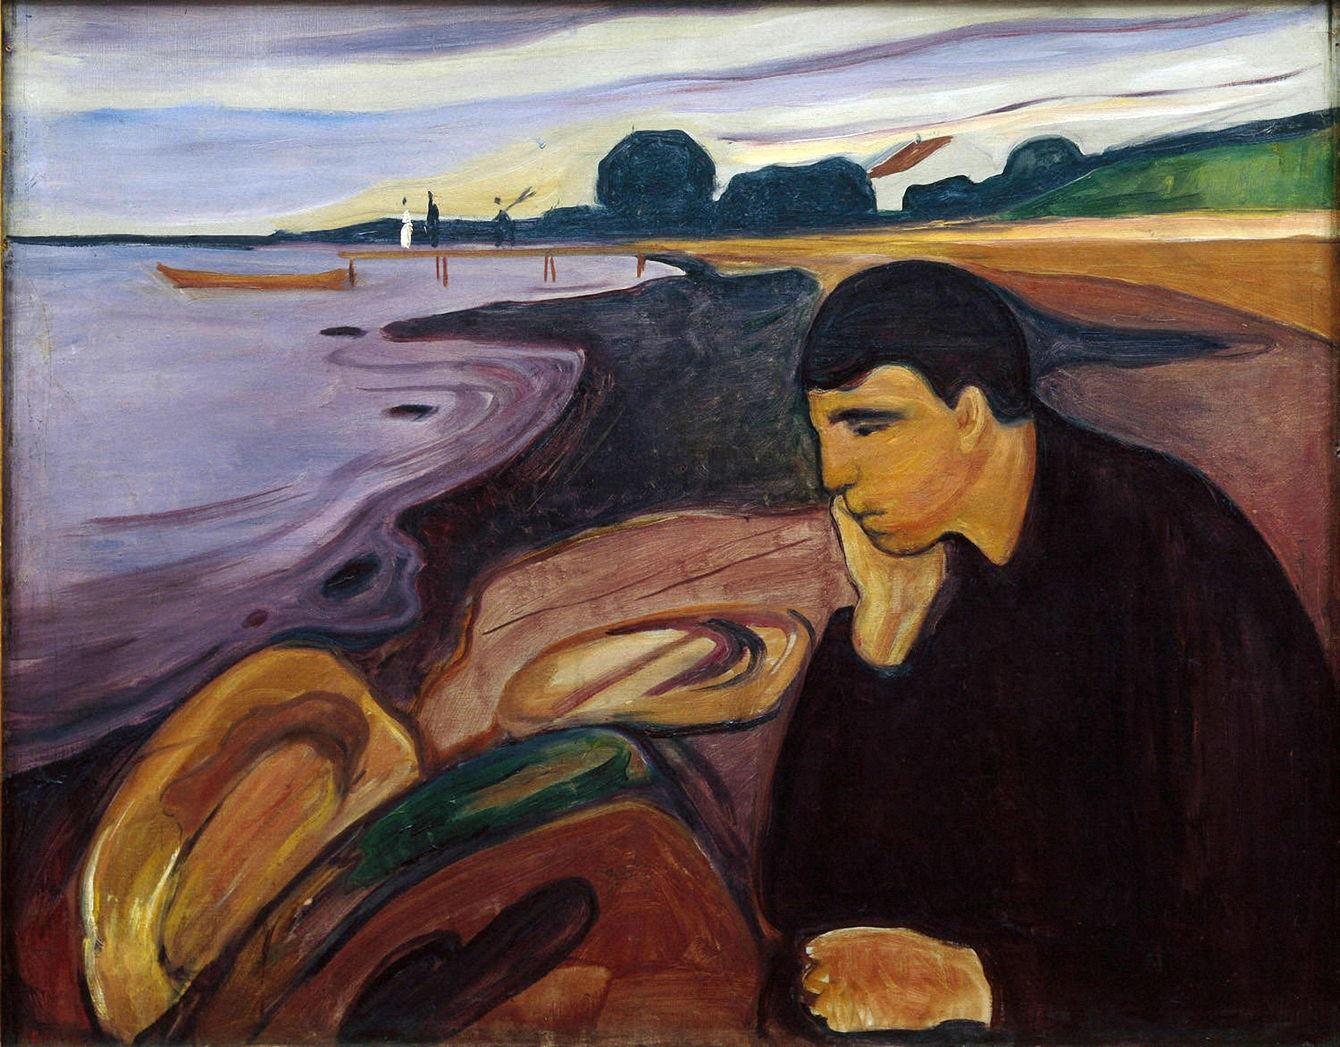 Edvard Munch. Melancolia, 1894-6